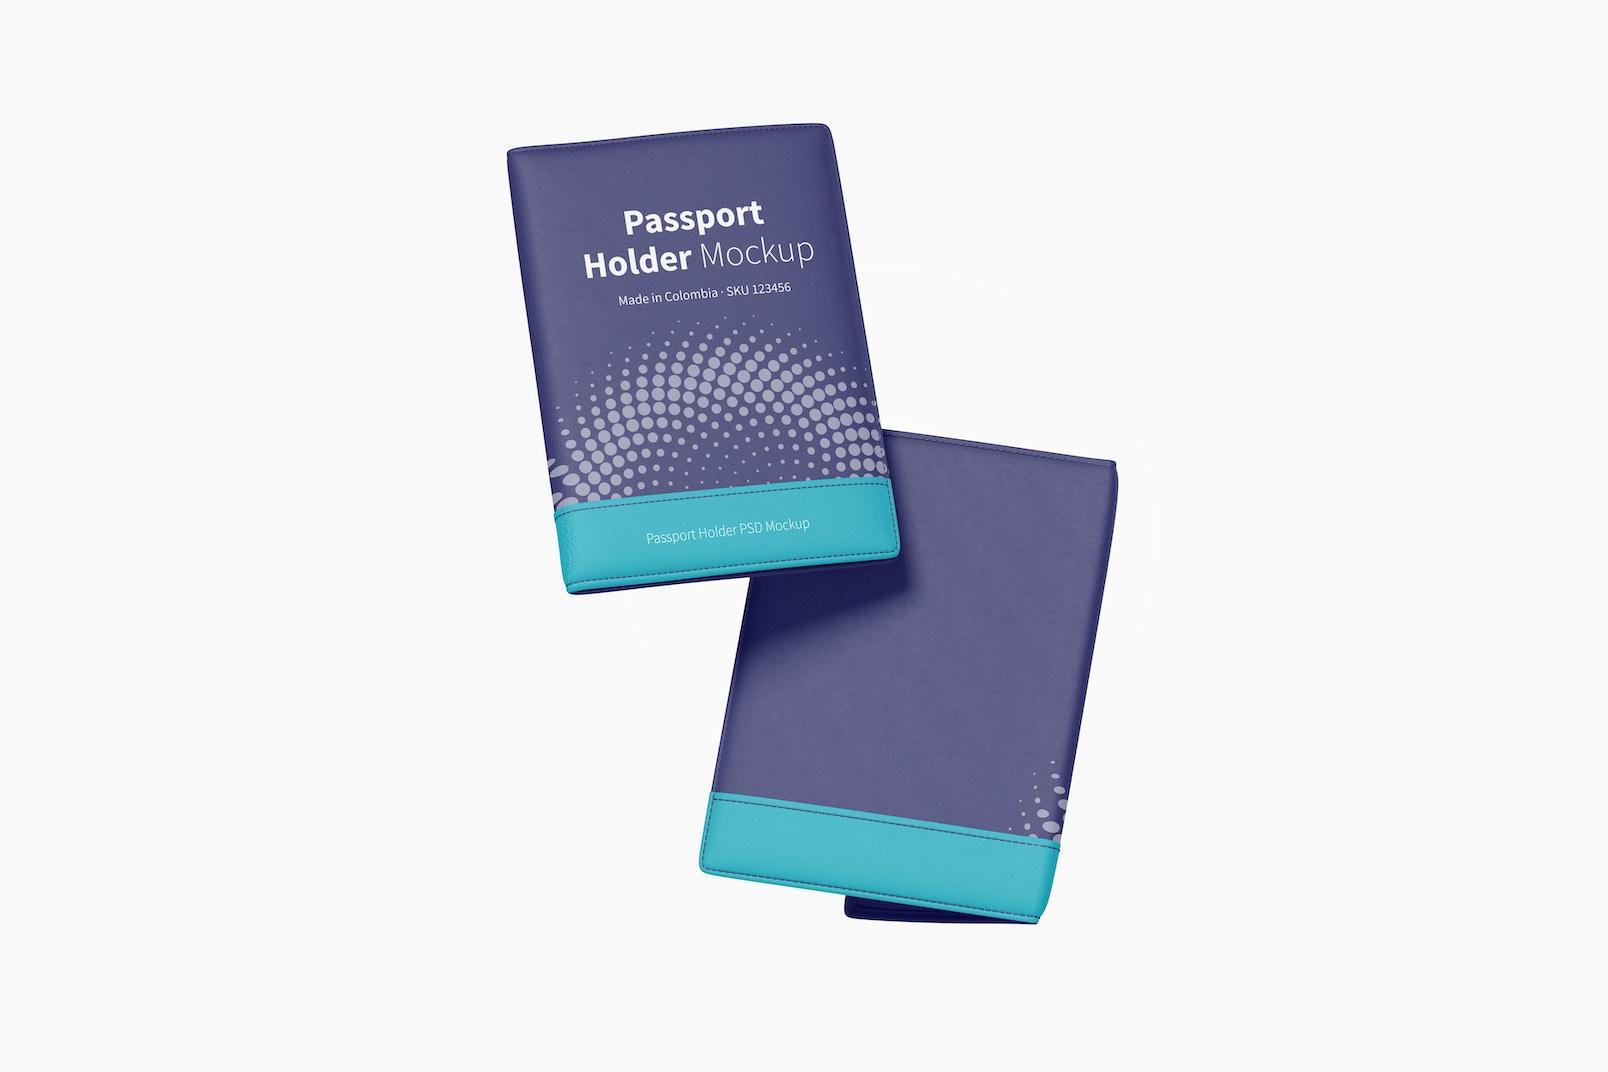 Passport Holder Mockup